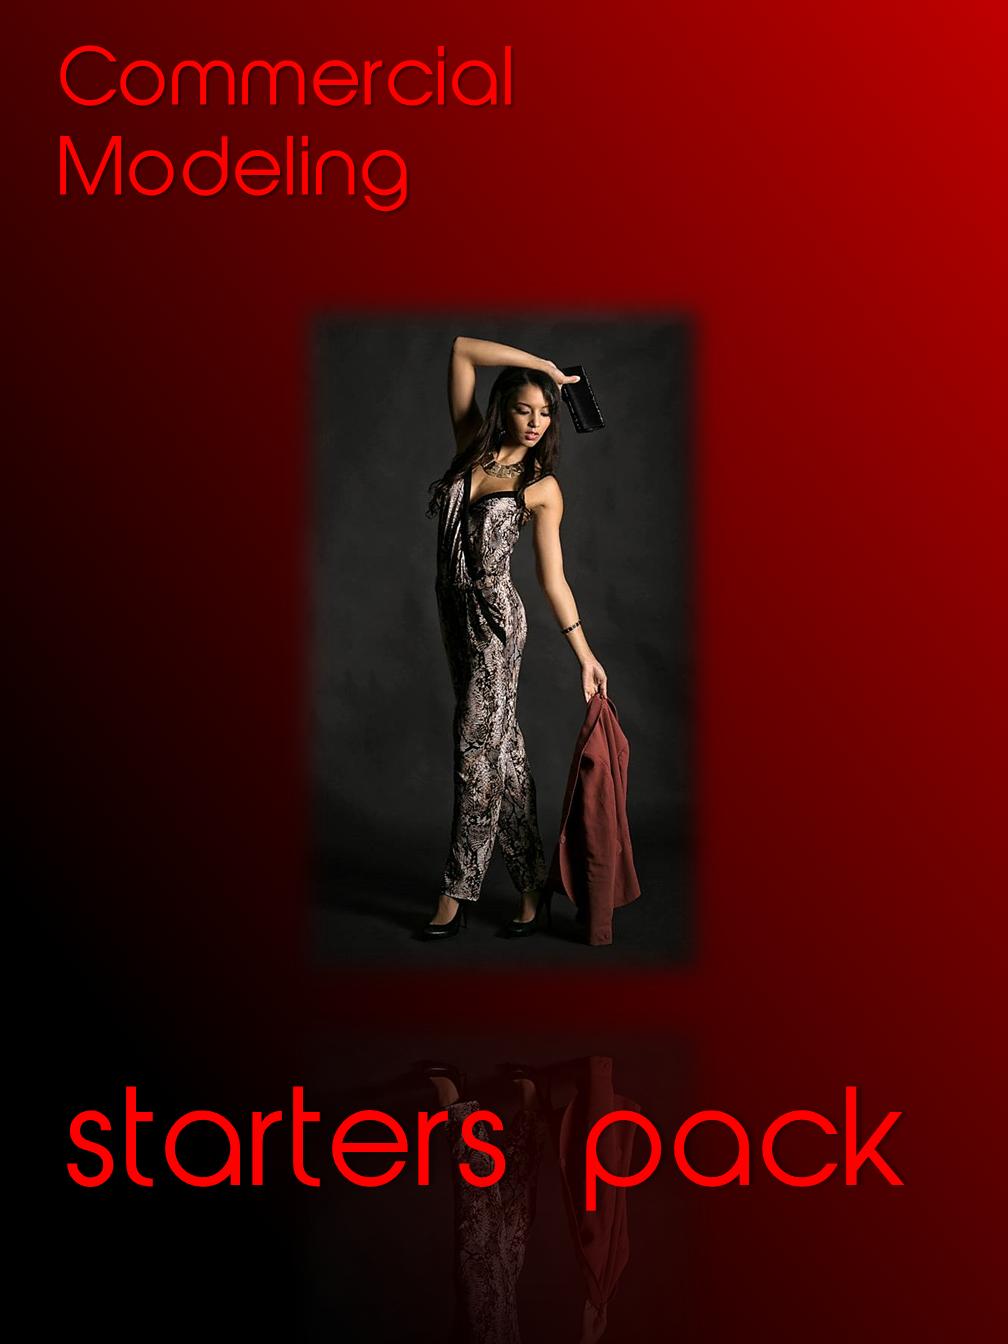 Commercial Modeling